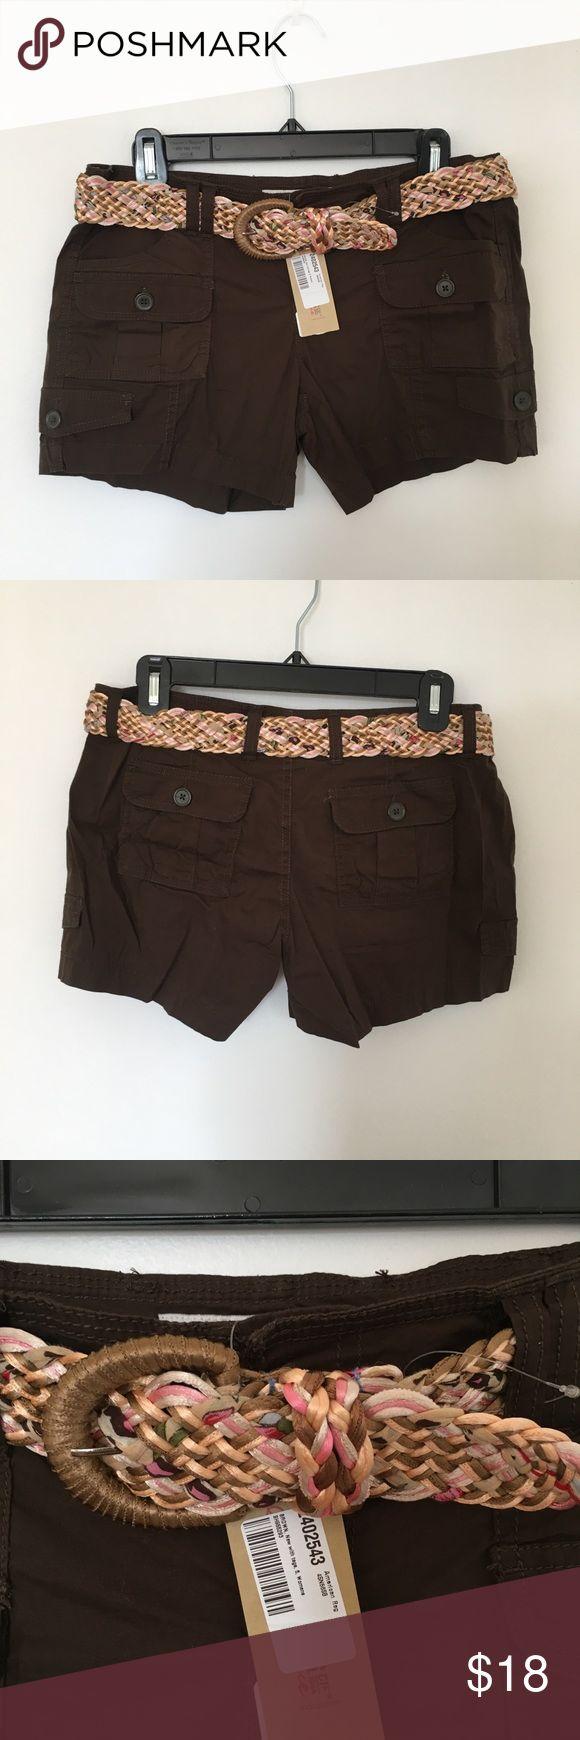 American Rag Cargo Shorts Item: Cargo Shorts (3.5 inch inseam)   Designer: American Rag  Size: 5  Condition NWT American Rag Shorts Cargos